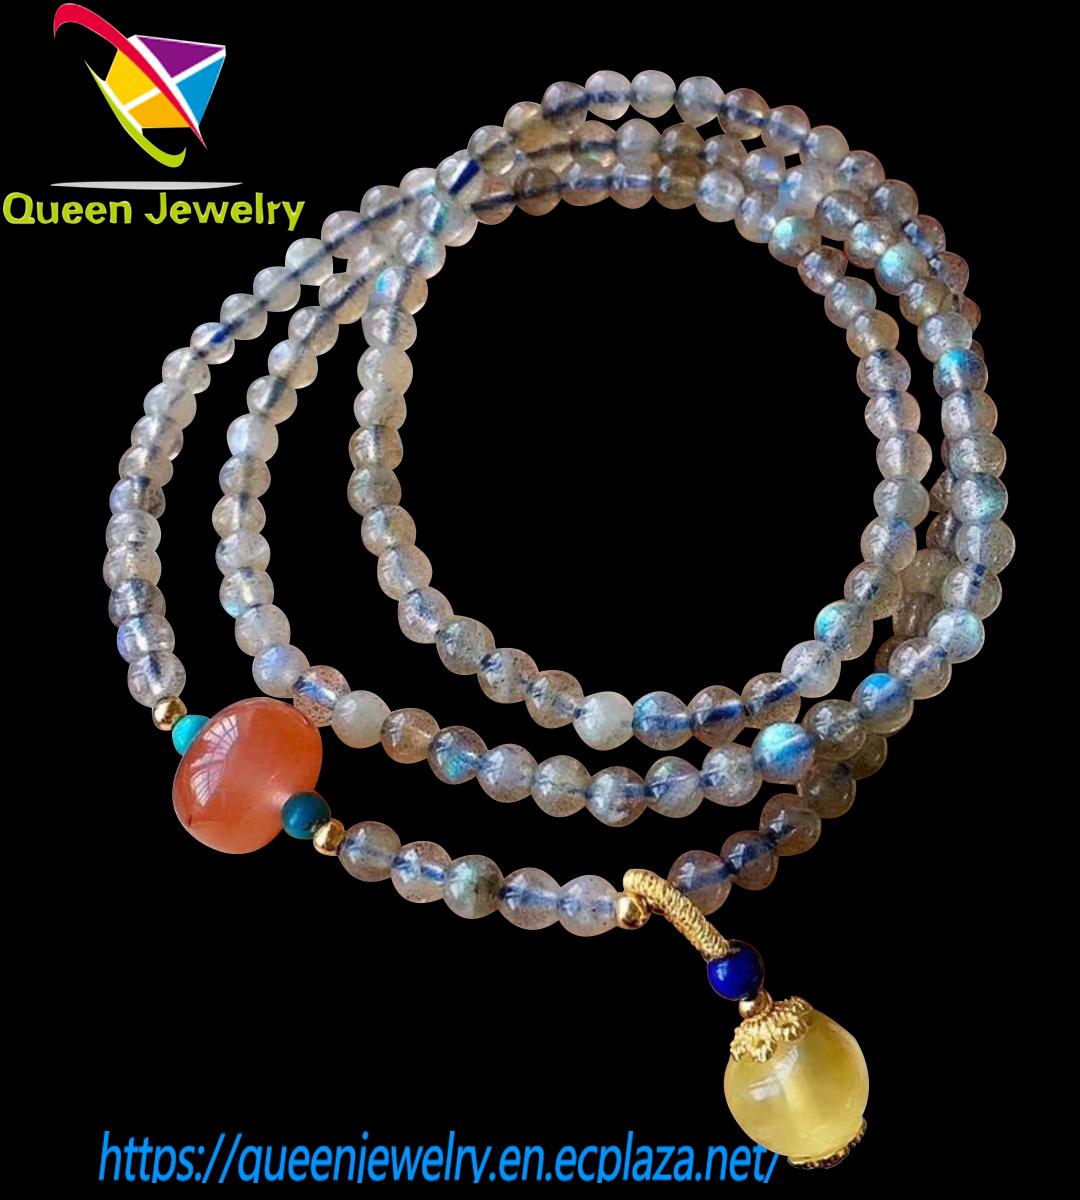 moonstone magic jewelry Beautiful Powerful Beaded Bracelet gemstone Fashion Healing Gift Wellness